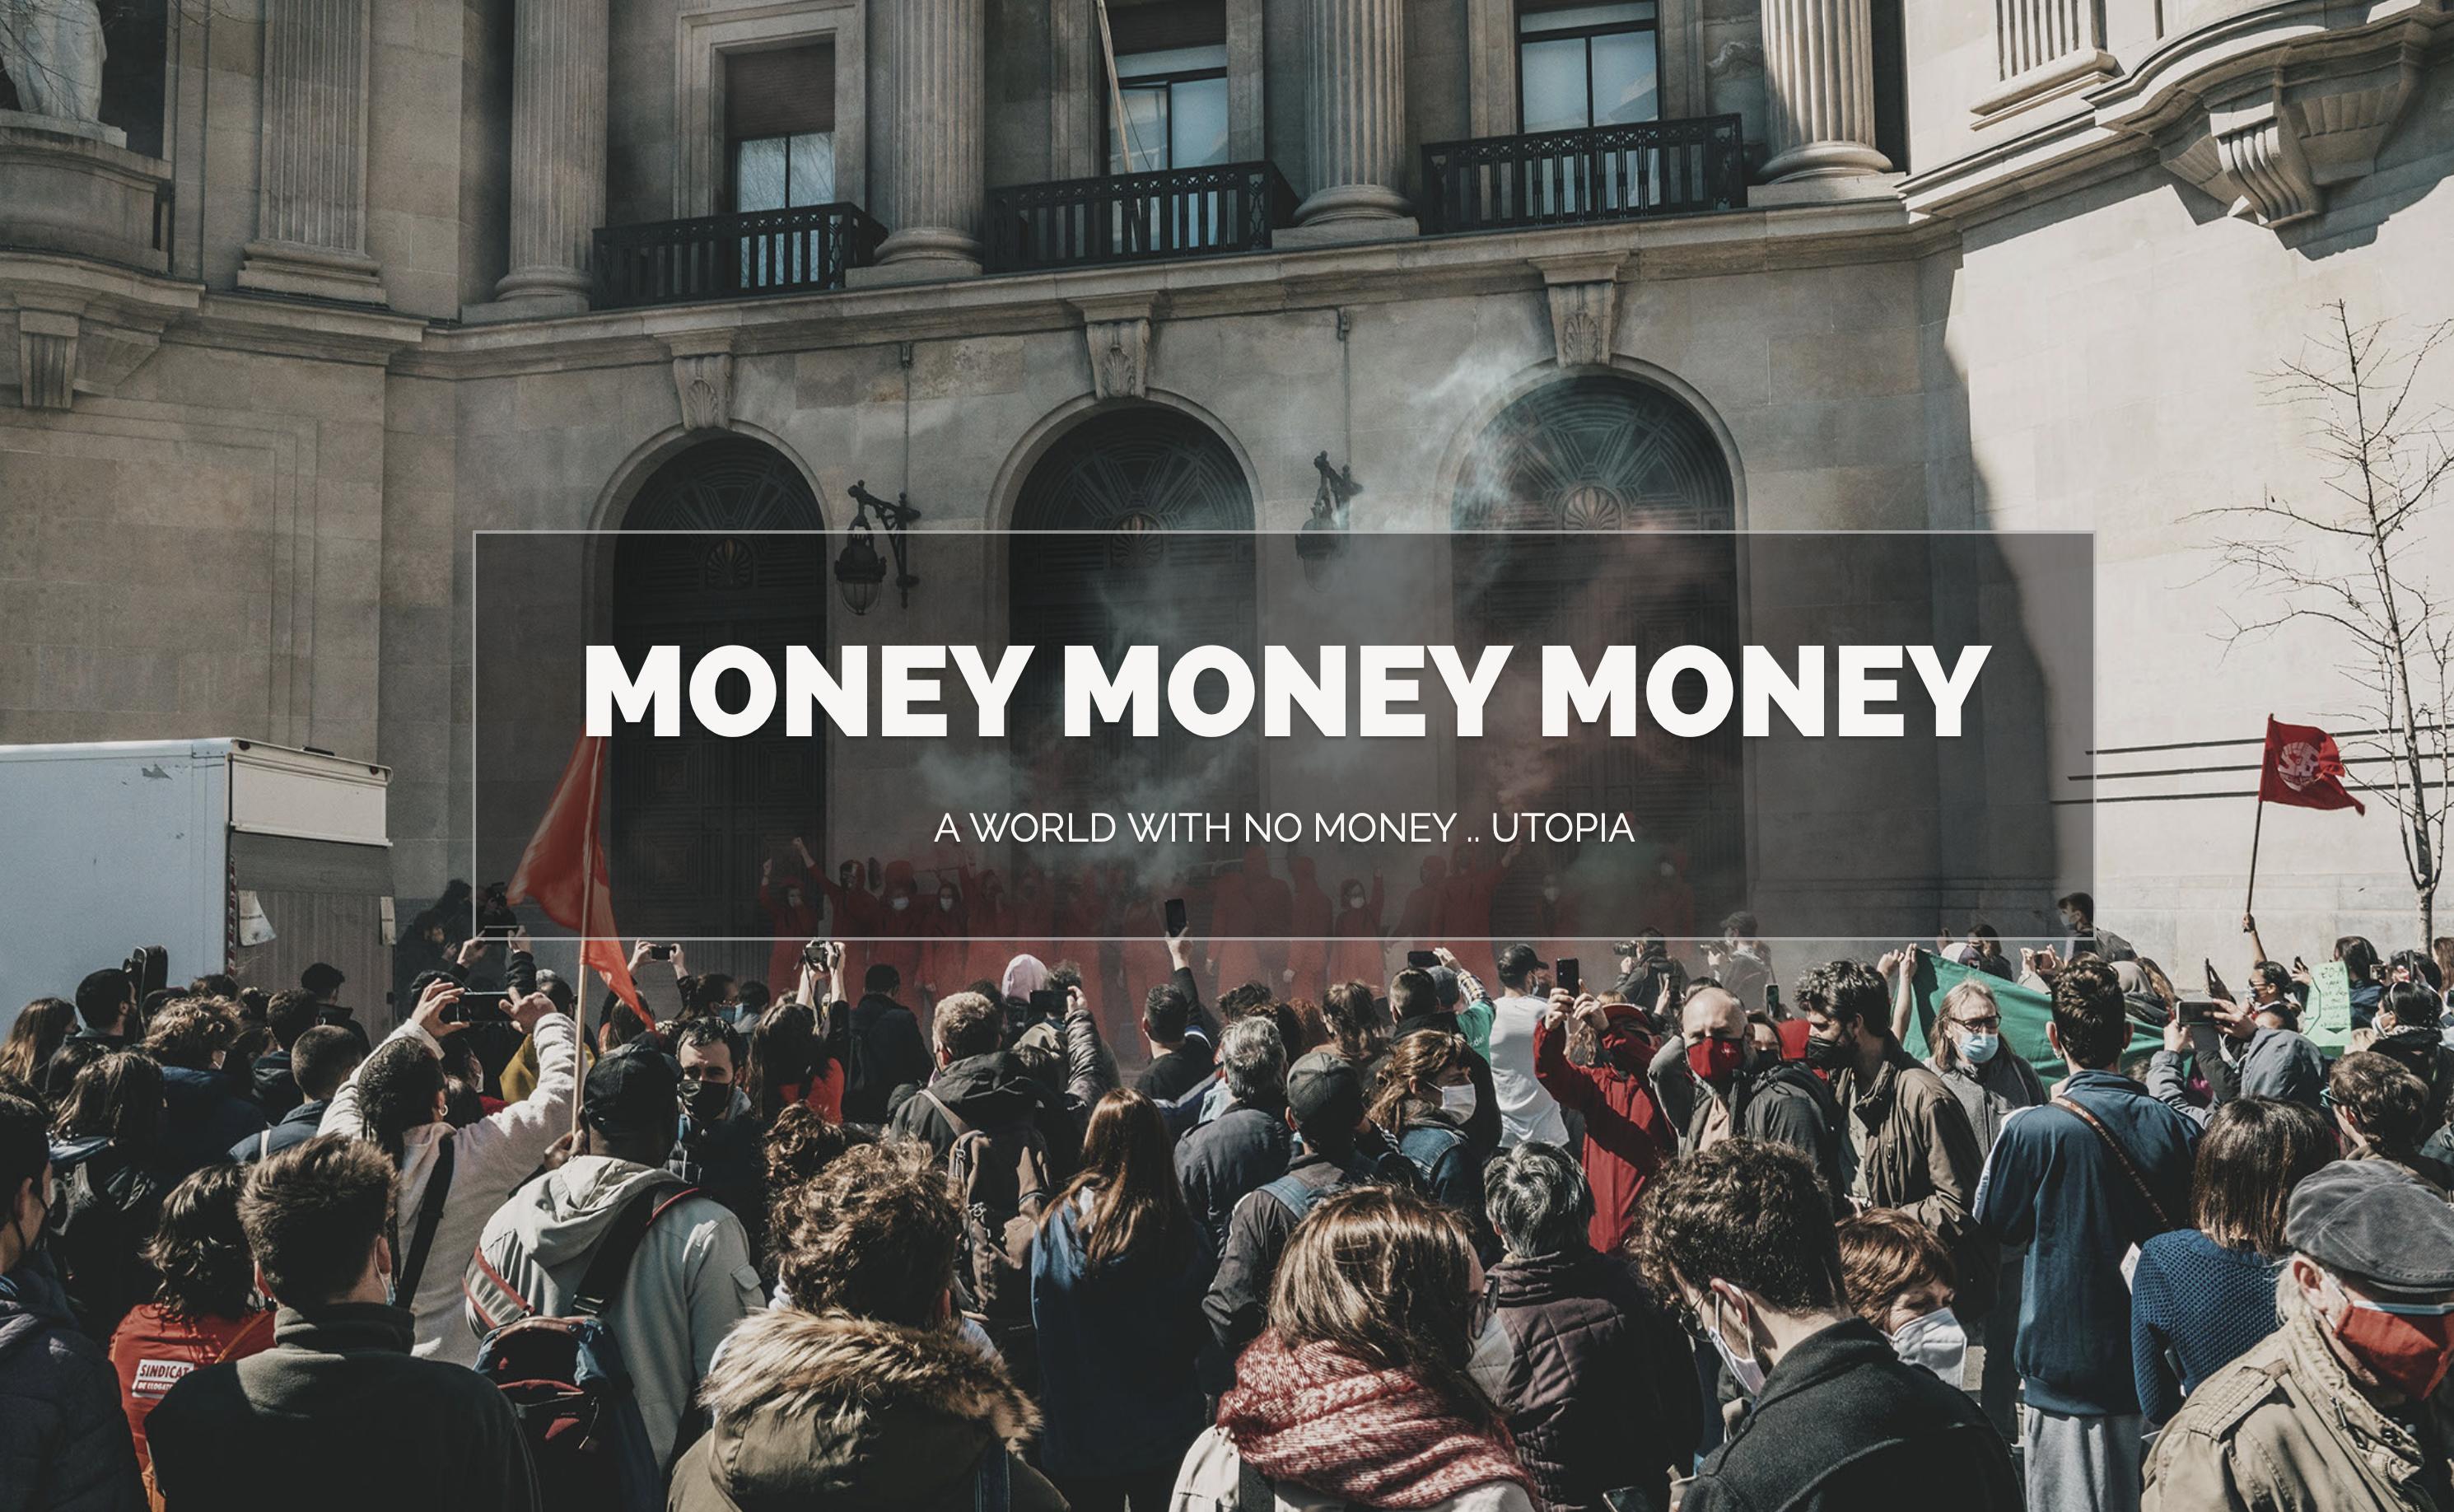 Money Money Money – A world with no money